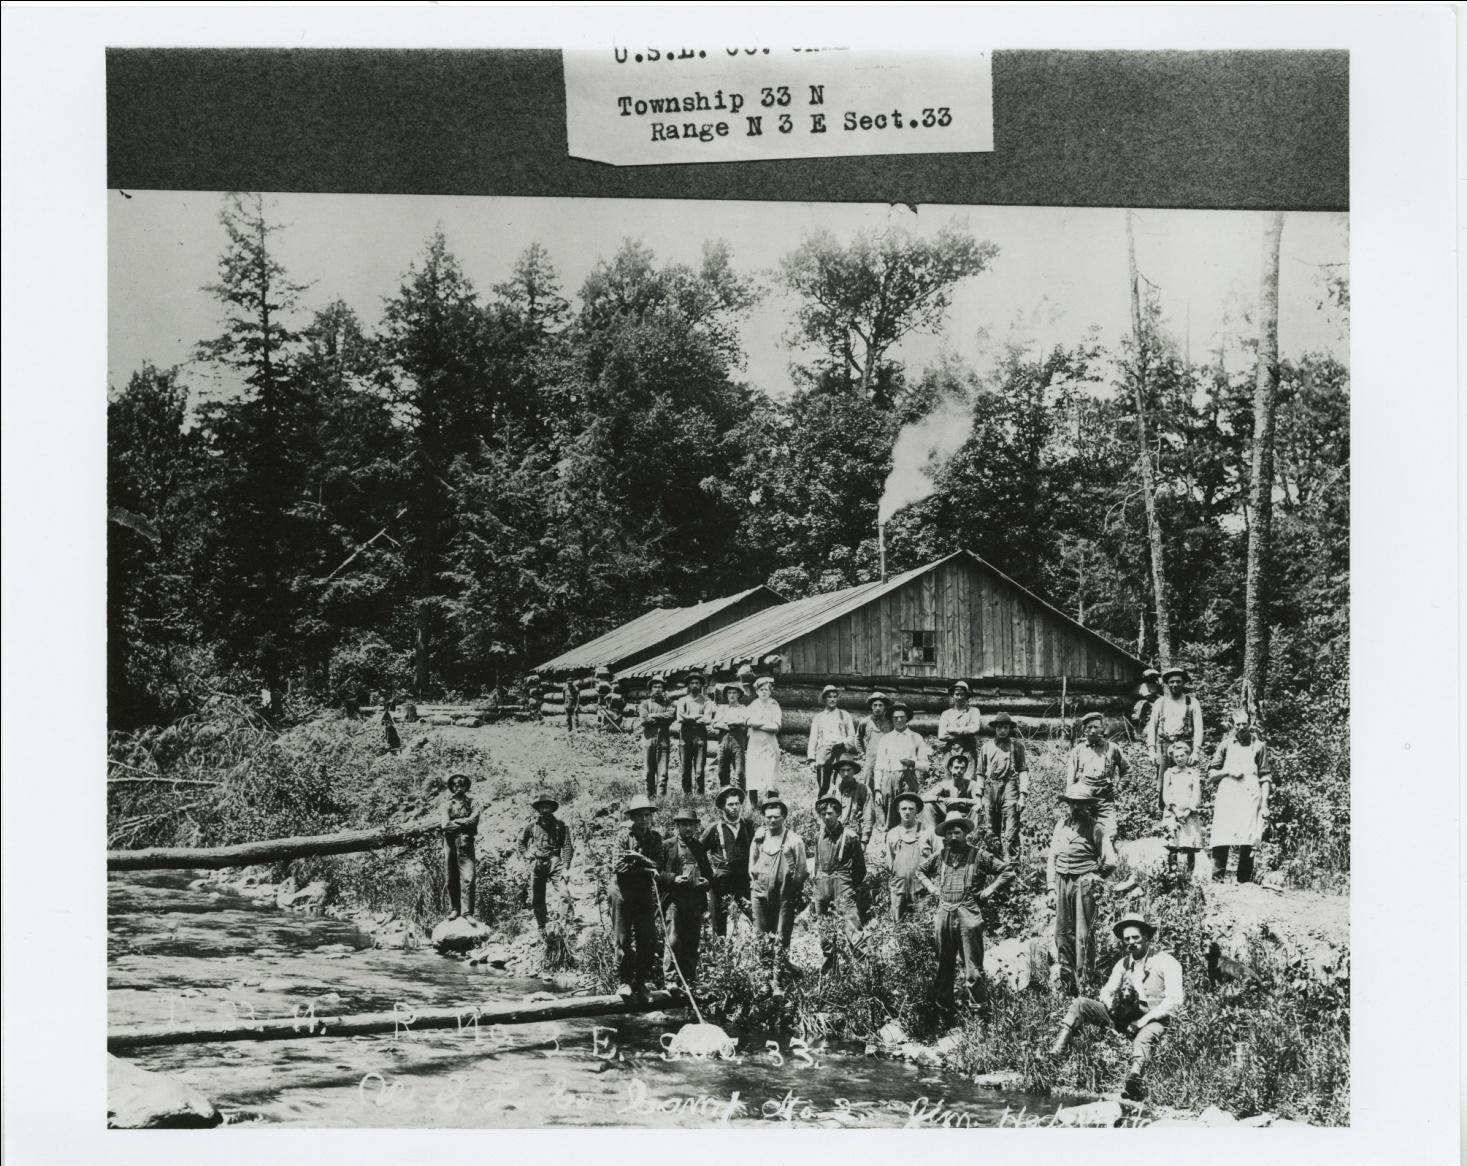 "C:\Users\Robert P. Rusch\Desktop\II. RLHSoc\Documents & Photos-Scanned\Rib Lake History 10700-10799\10792-P. ""US Leather Company Camp 2, Township 33 N, Range N .jpg"